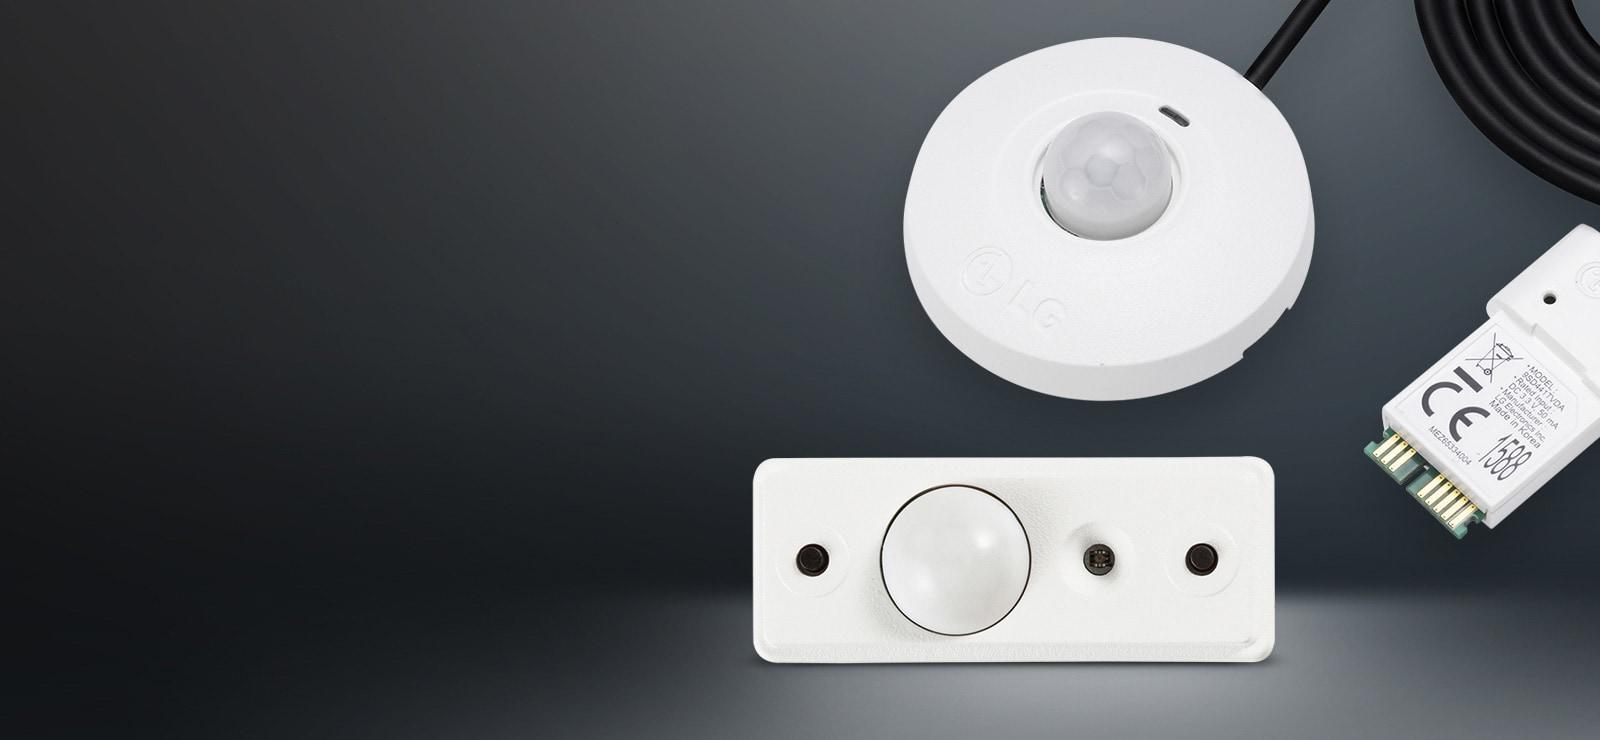 Control Solution | | Lighting | Business | LG Global